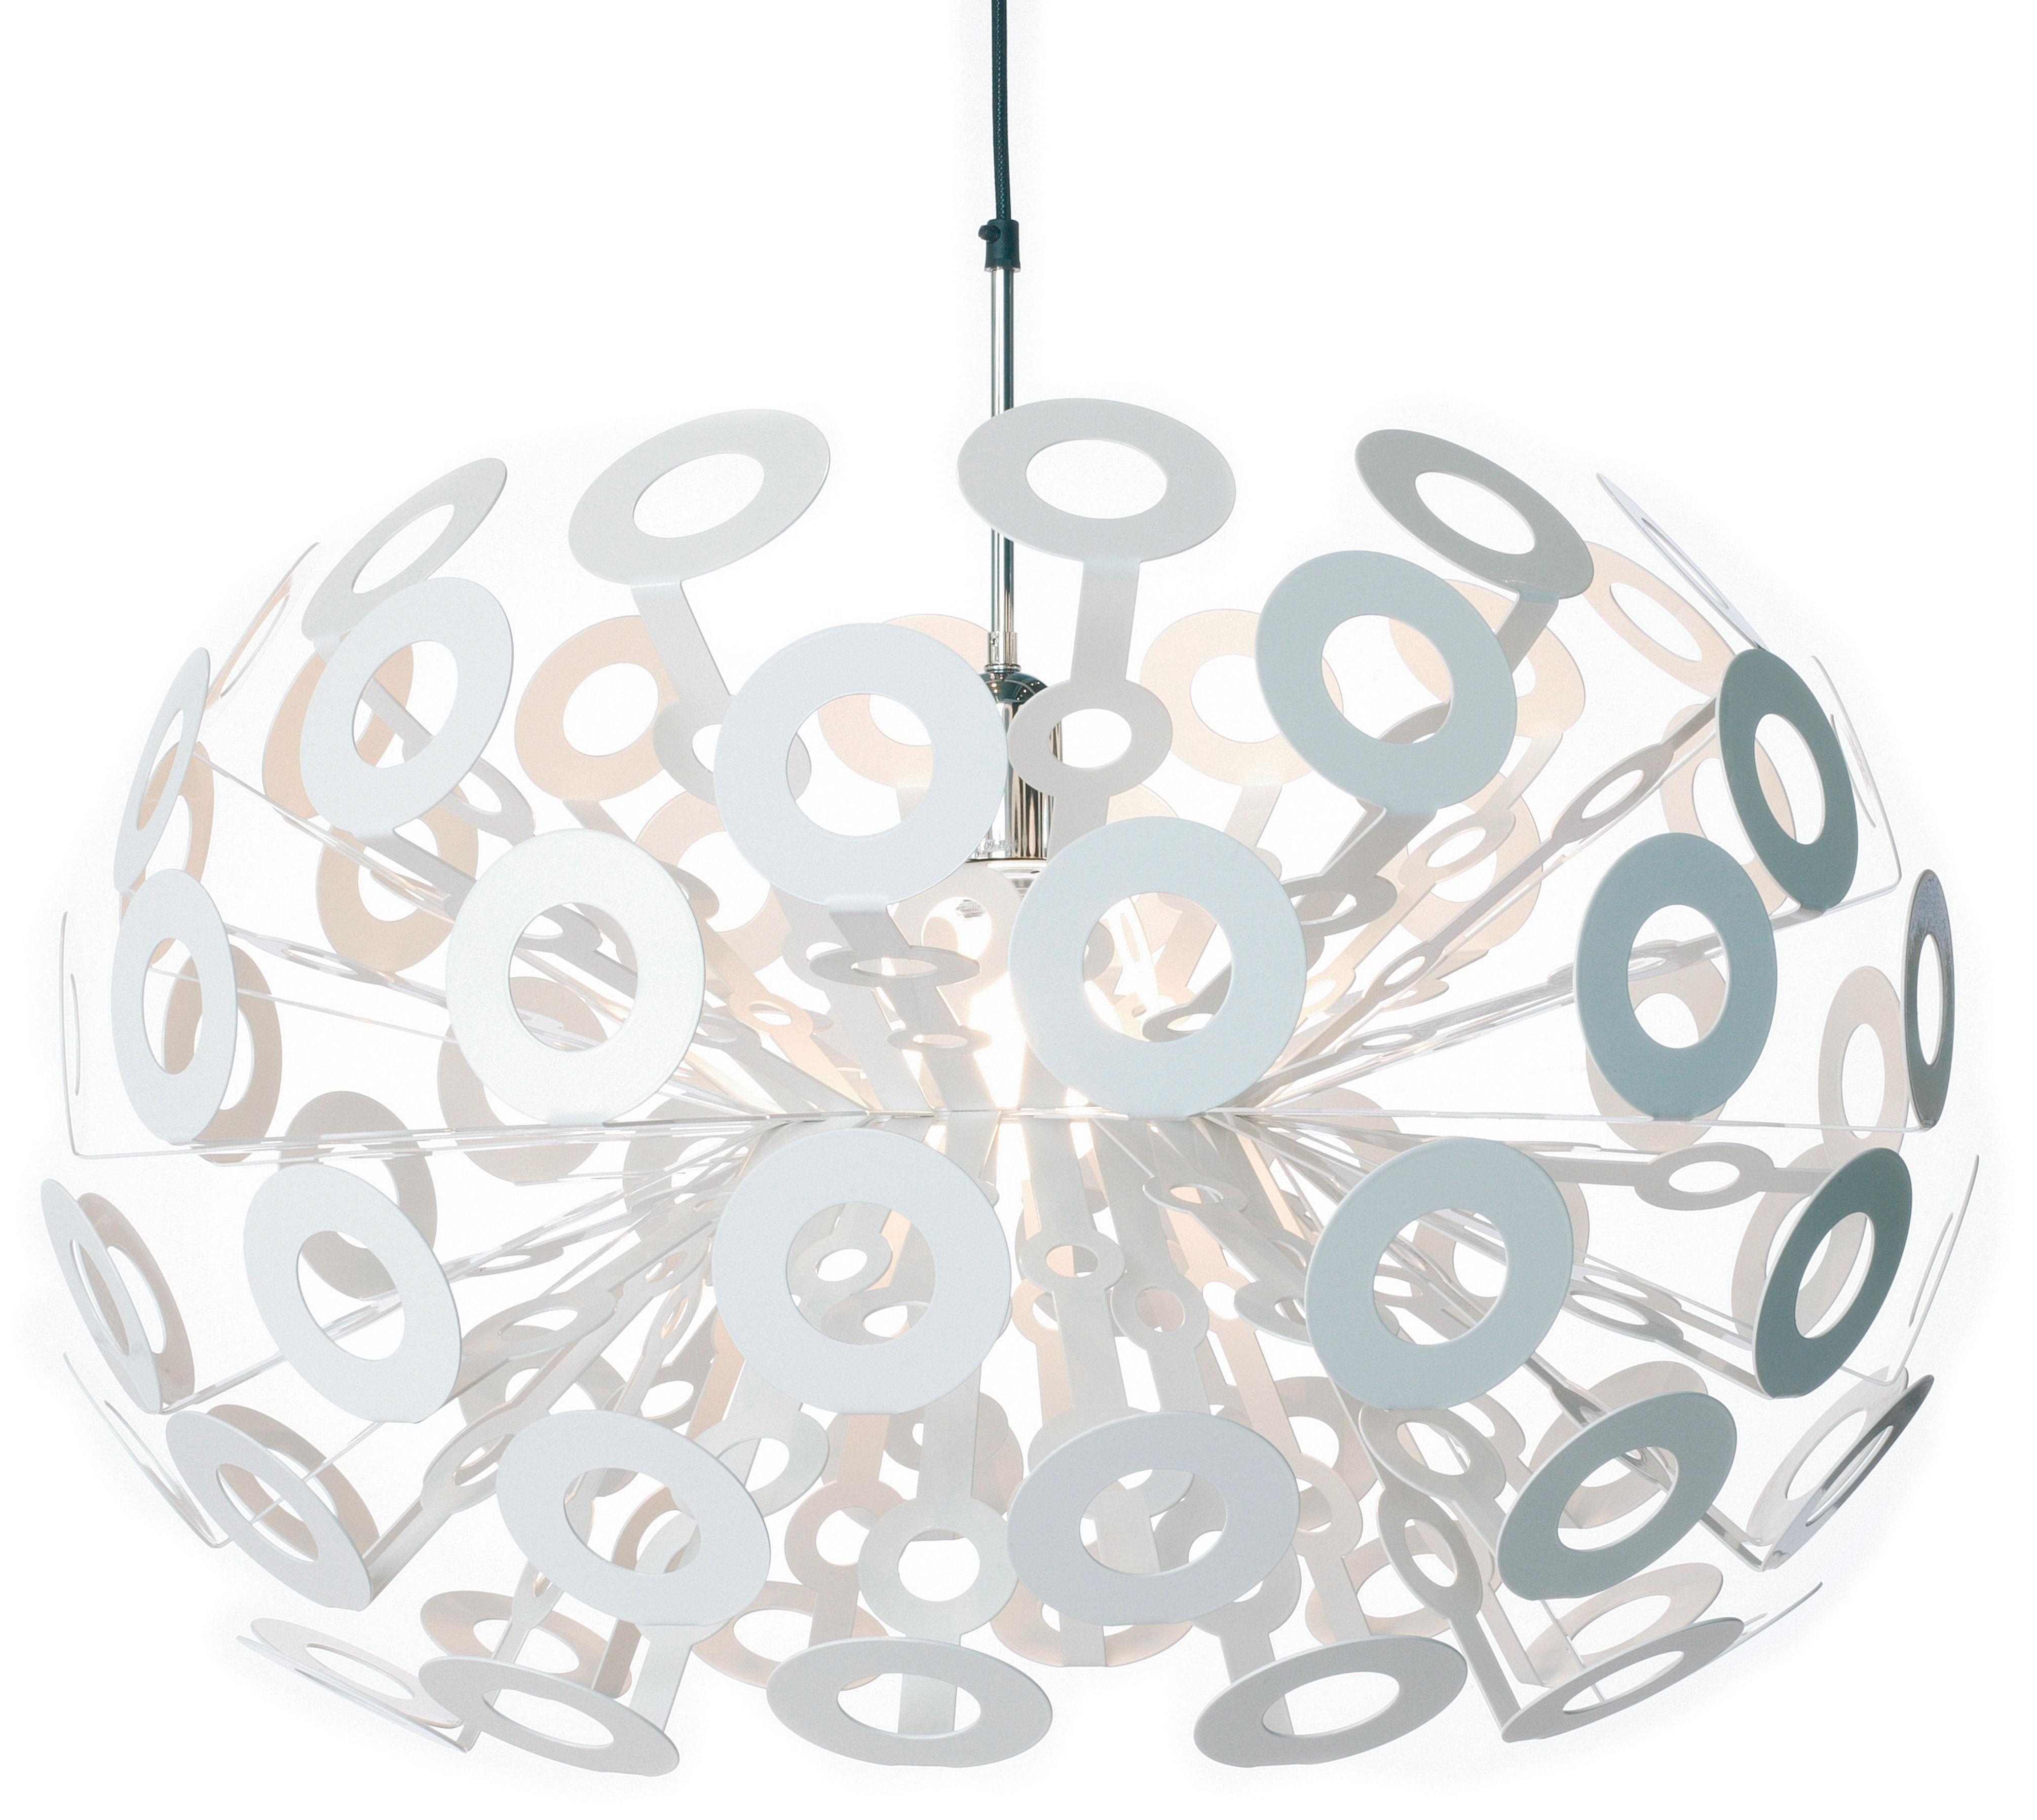 Lighting - Pendant Lighting - Dandelion Pendant by Moooi - White - Painted steel